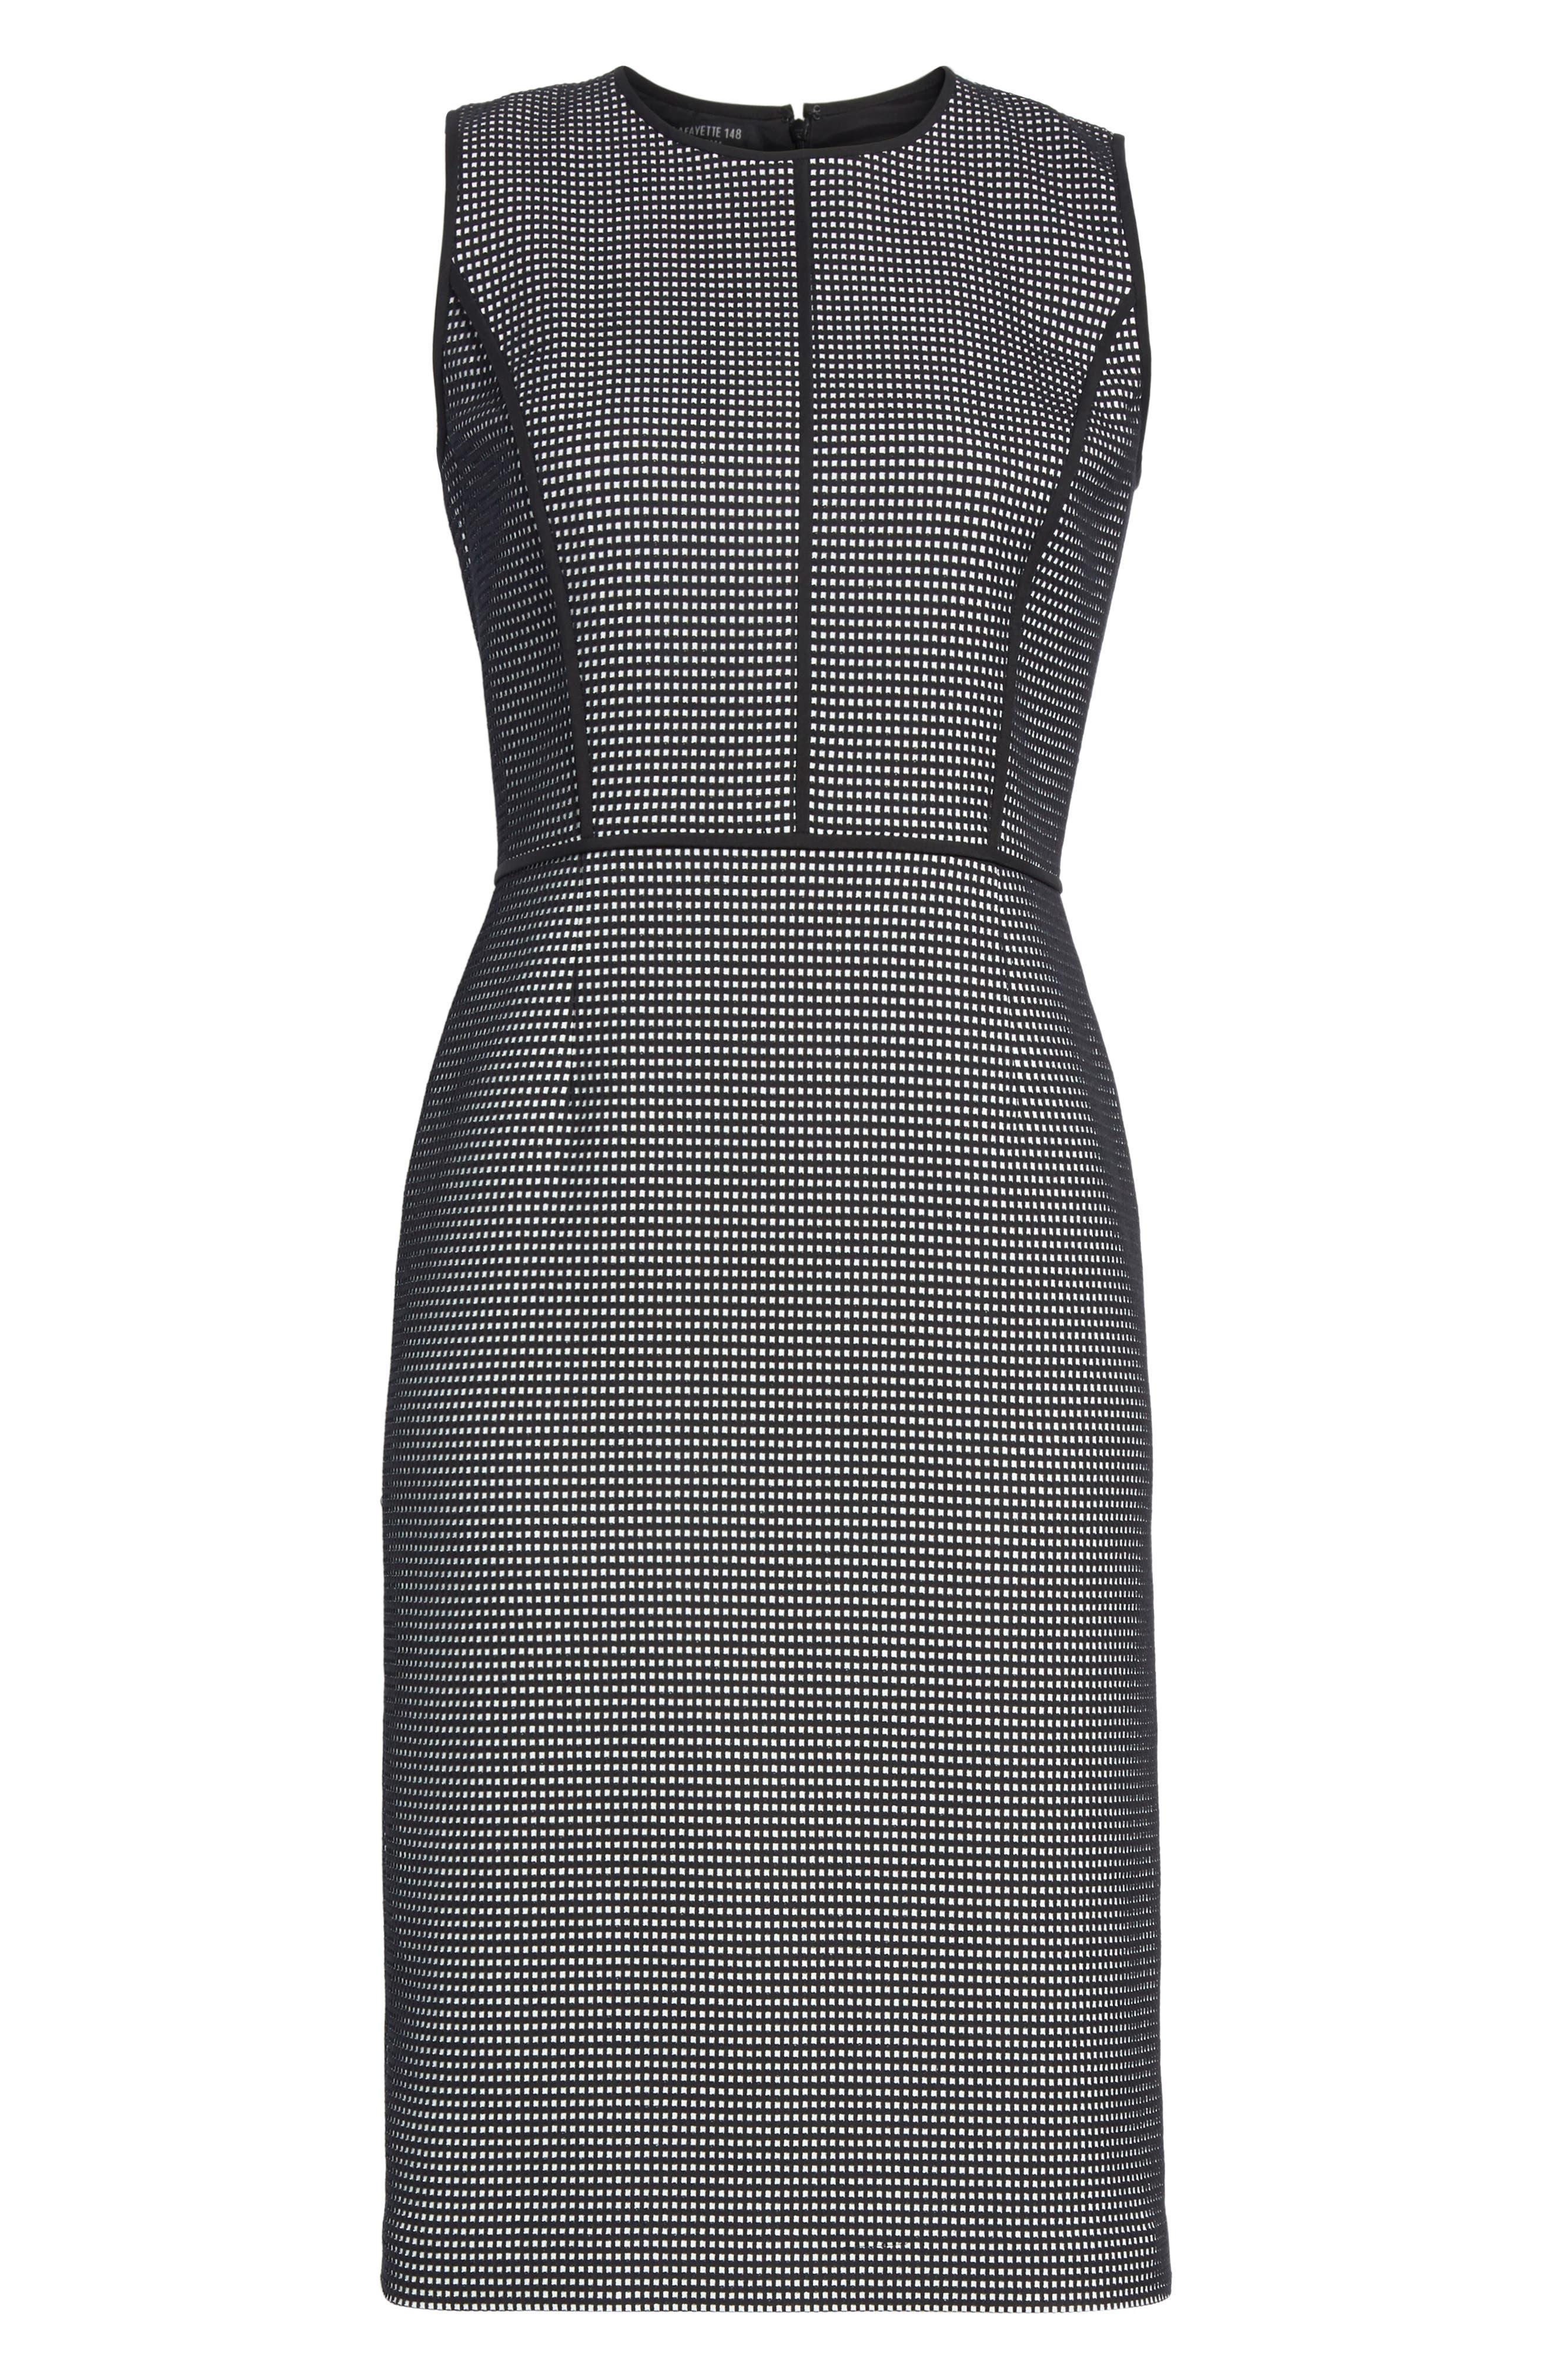 Bree Check Sheath Dress,                             Alternate thumbnail 6, color,                             083